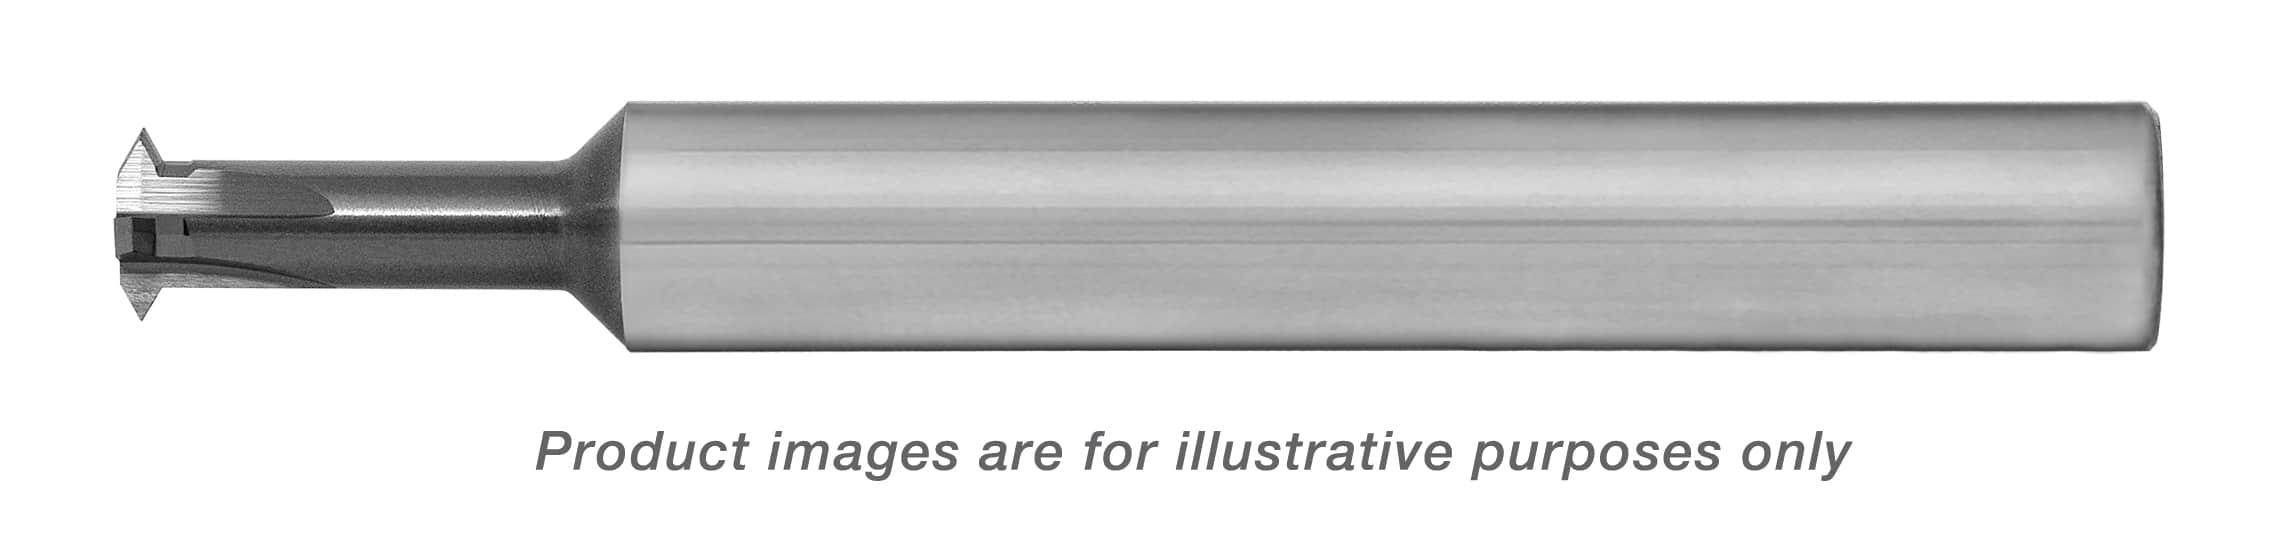 SINGLE PROFILE UN METRIC - Solid Carbide